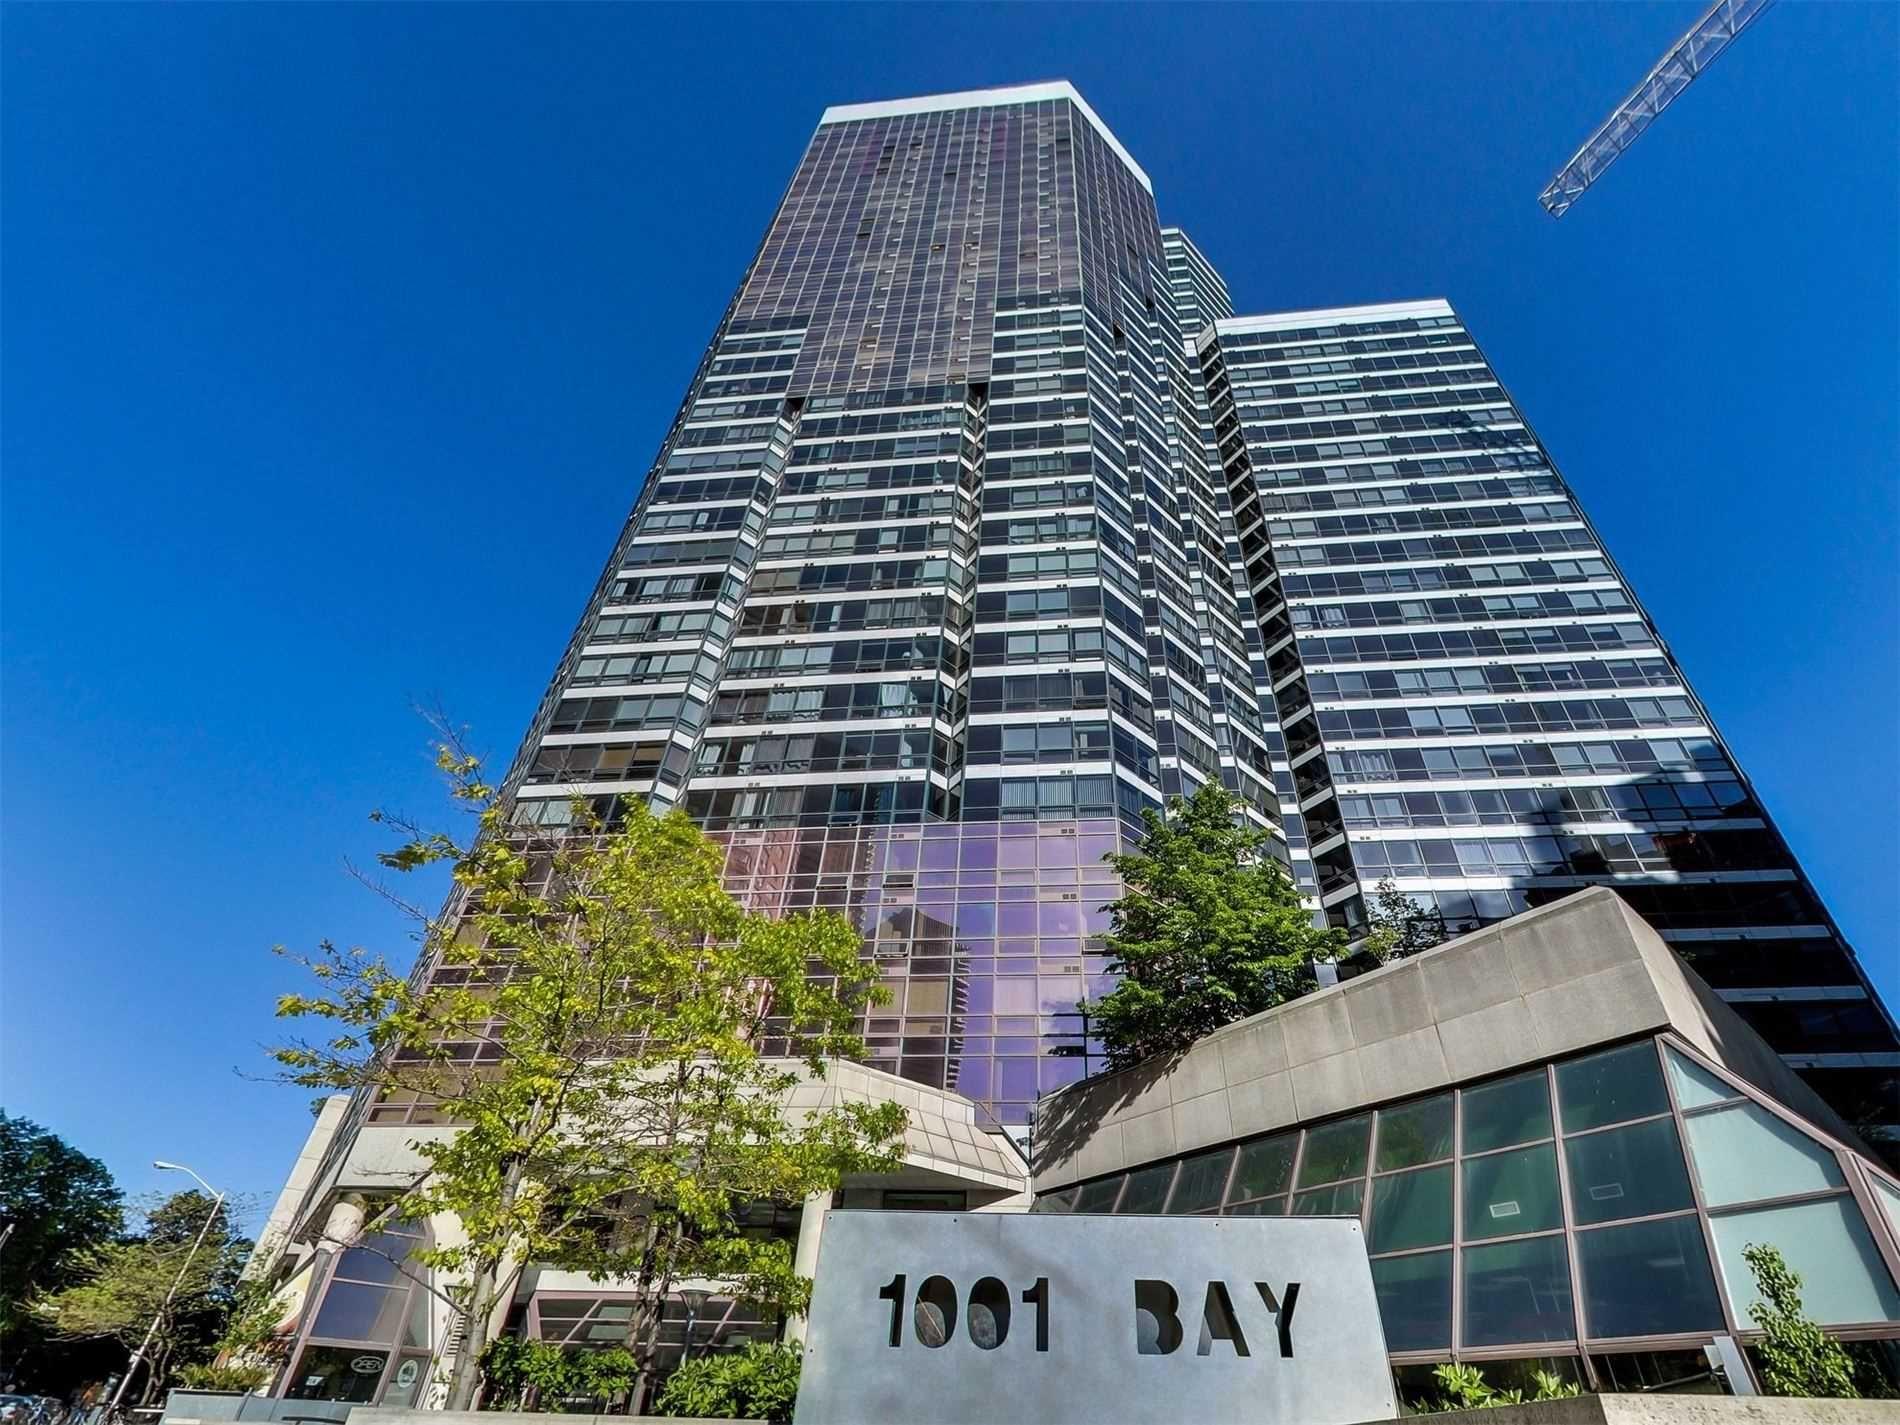 Main Photo: 1115 1001 Bay Street in Toronto: Bay Street Corridor Condo for sale (Toronto C01)  : MLS®# C4672794